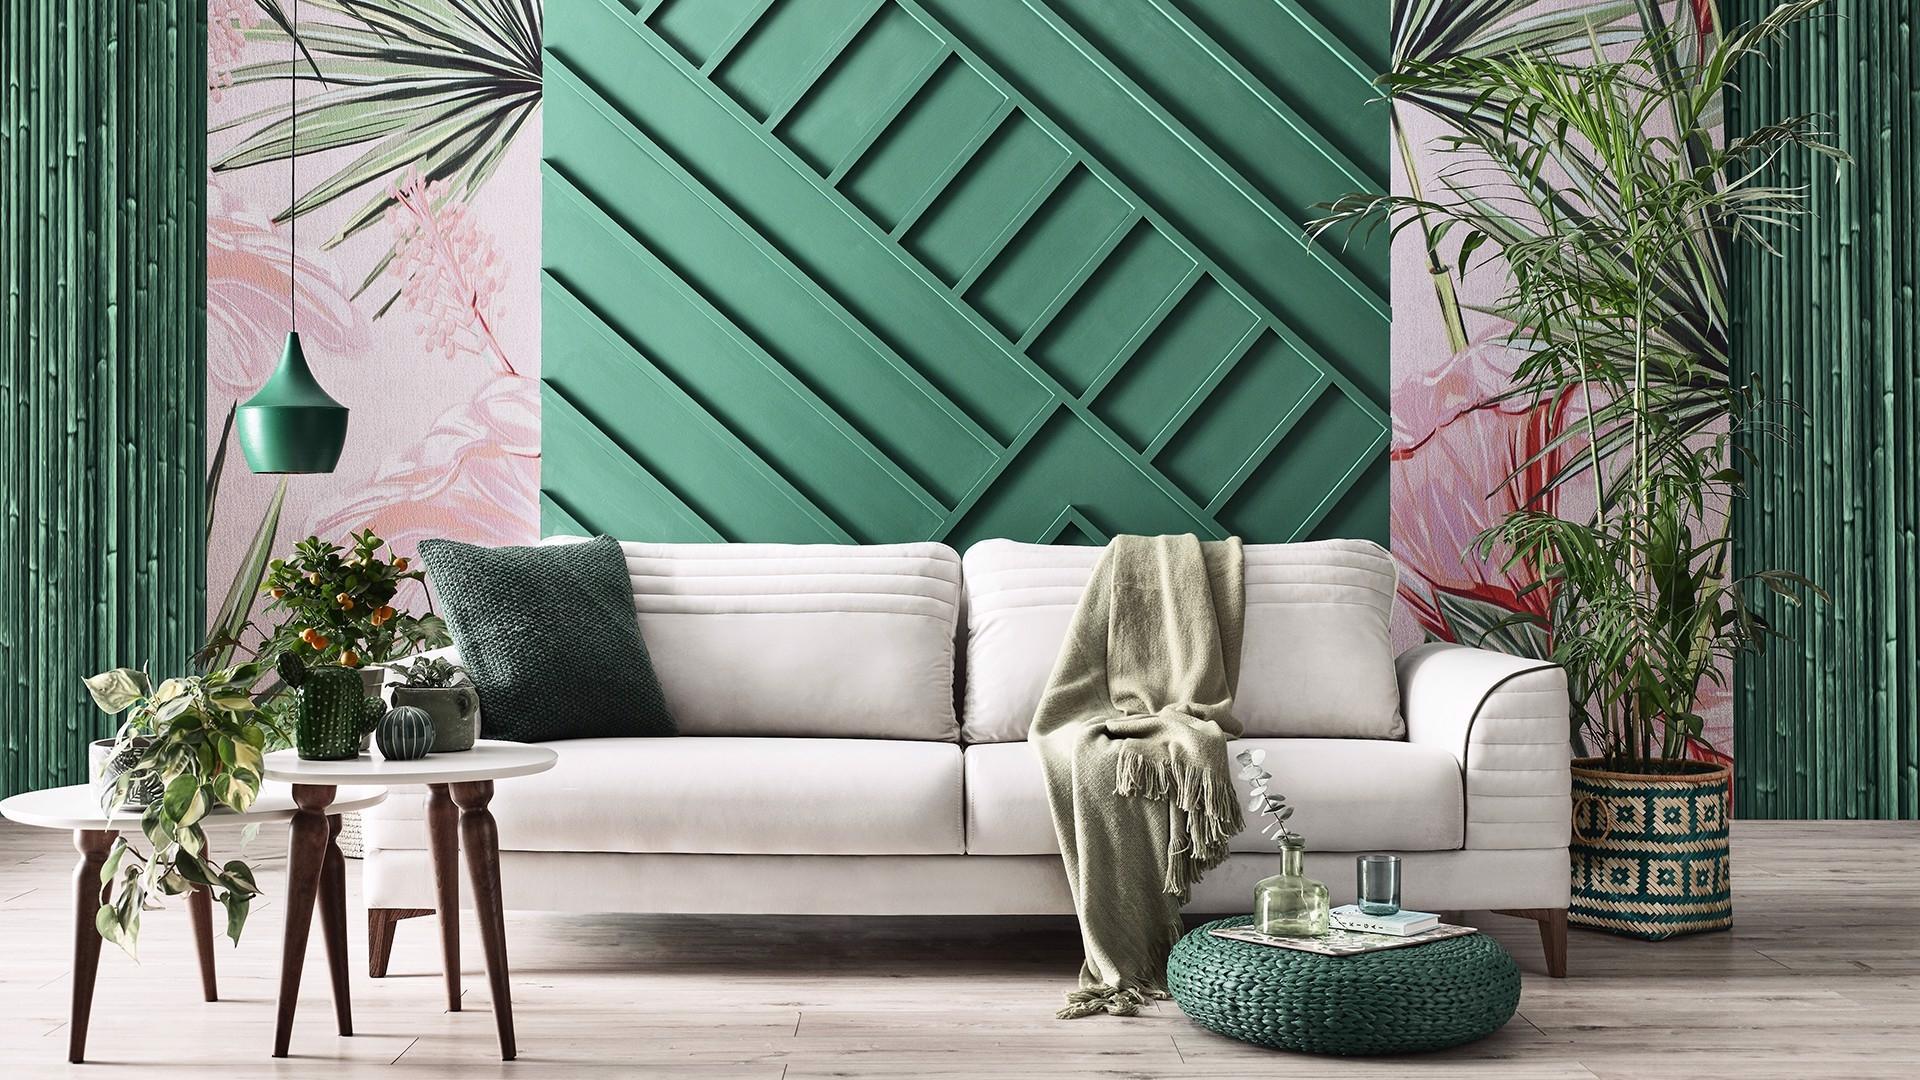 Canapea extensibila cu lada de depozitare, tapitata cu stofa, 3 locuri Gloria Ivoir, l237xA94xH81 cm